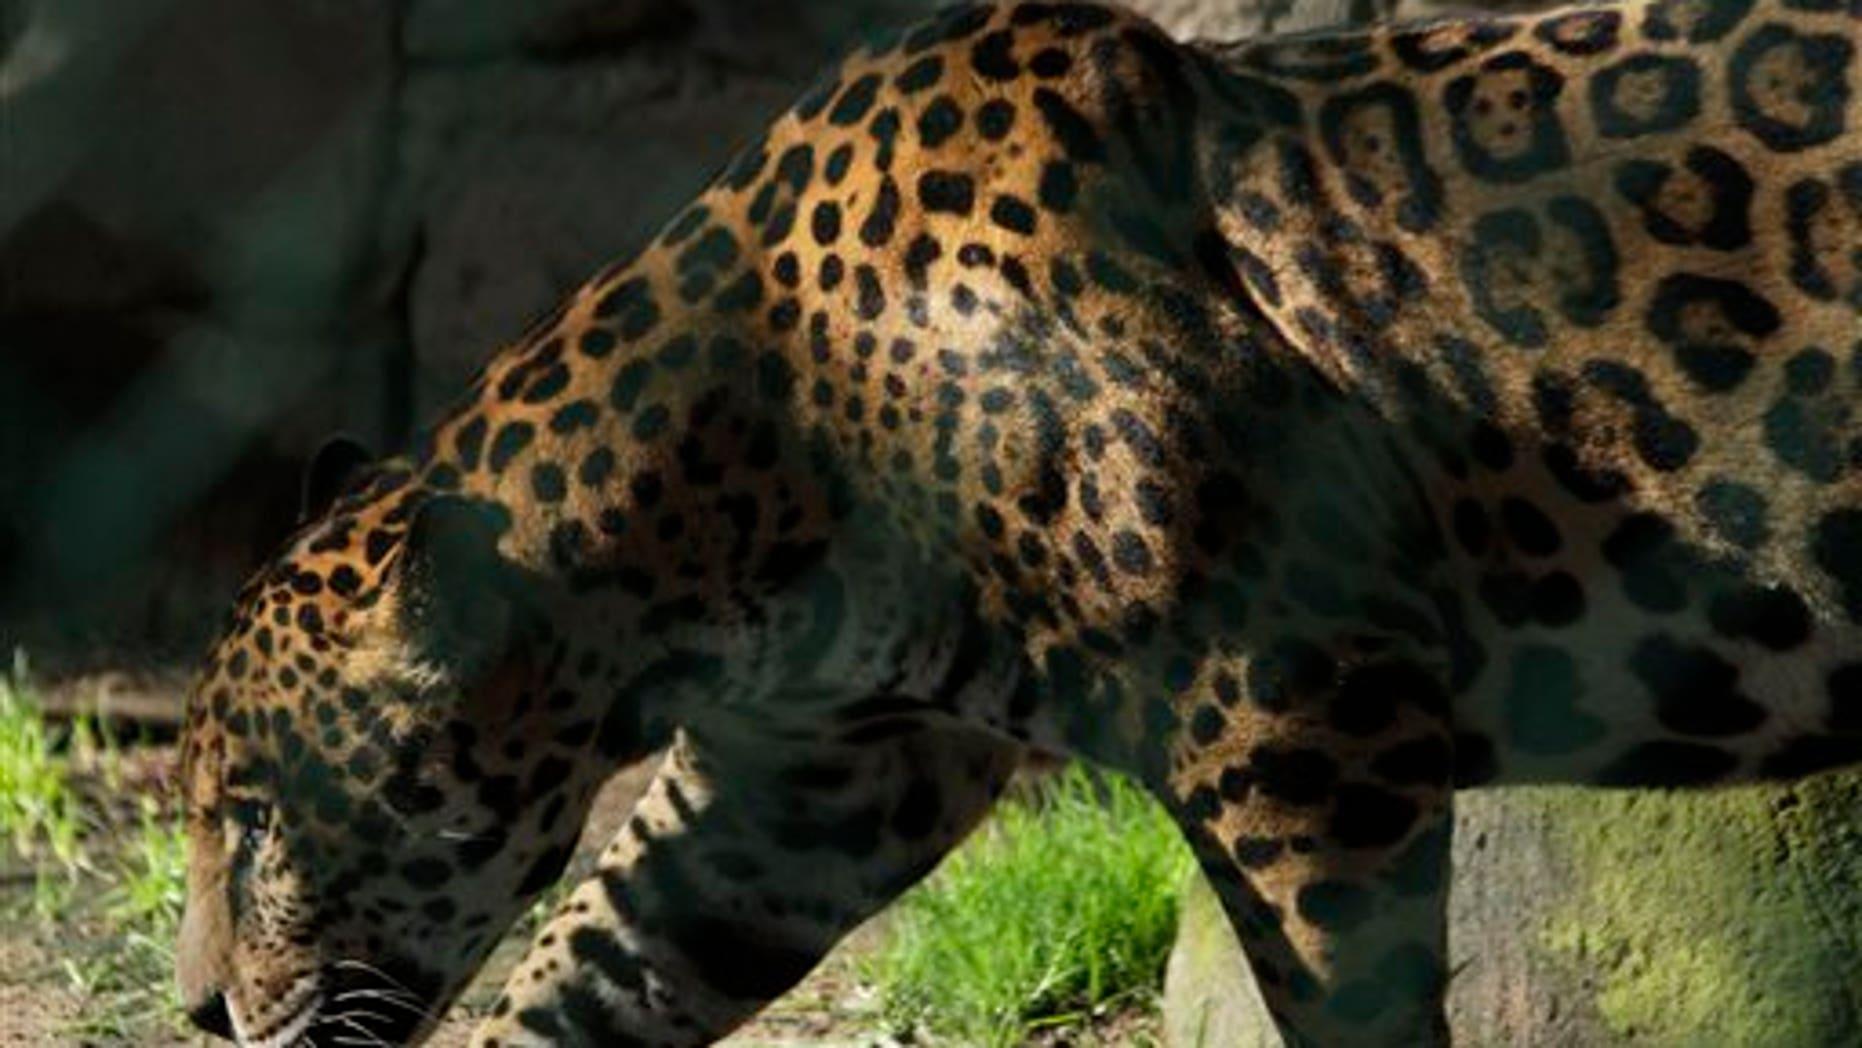 A jaguar walks in a public zoo in Zacango, Mexico, Aug. 17, 2011. (Associated Press)